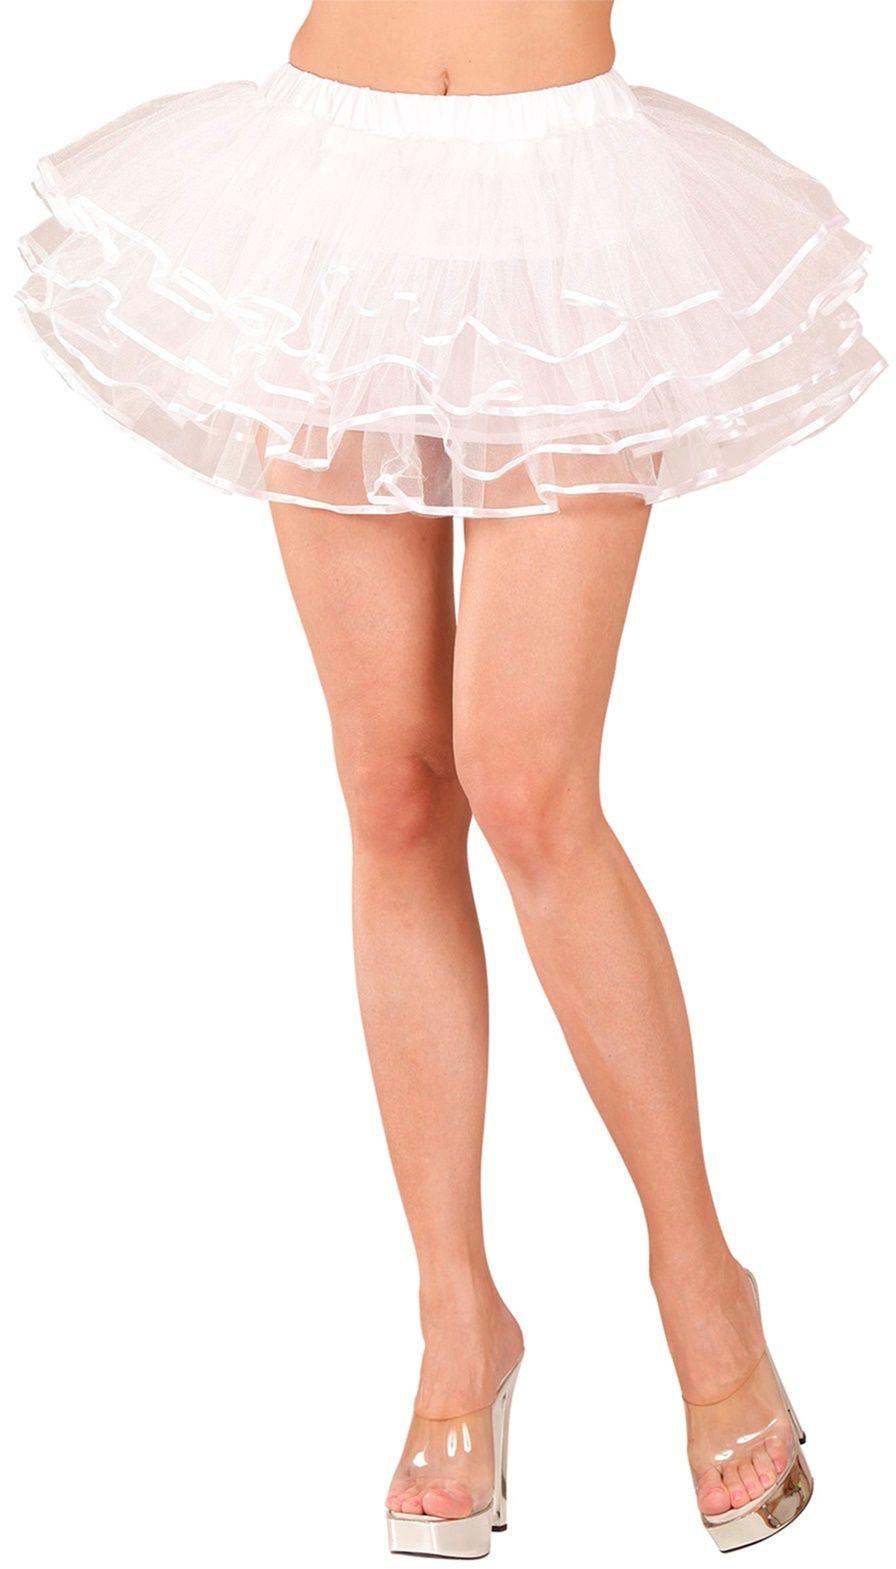 Witte luxe ballerina rokje